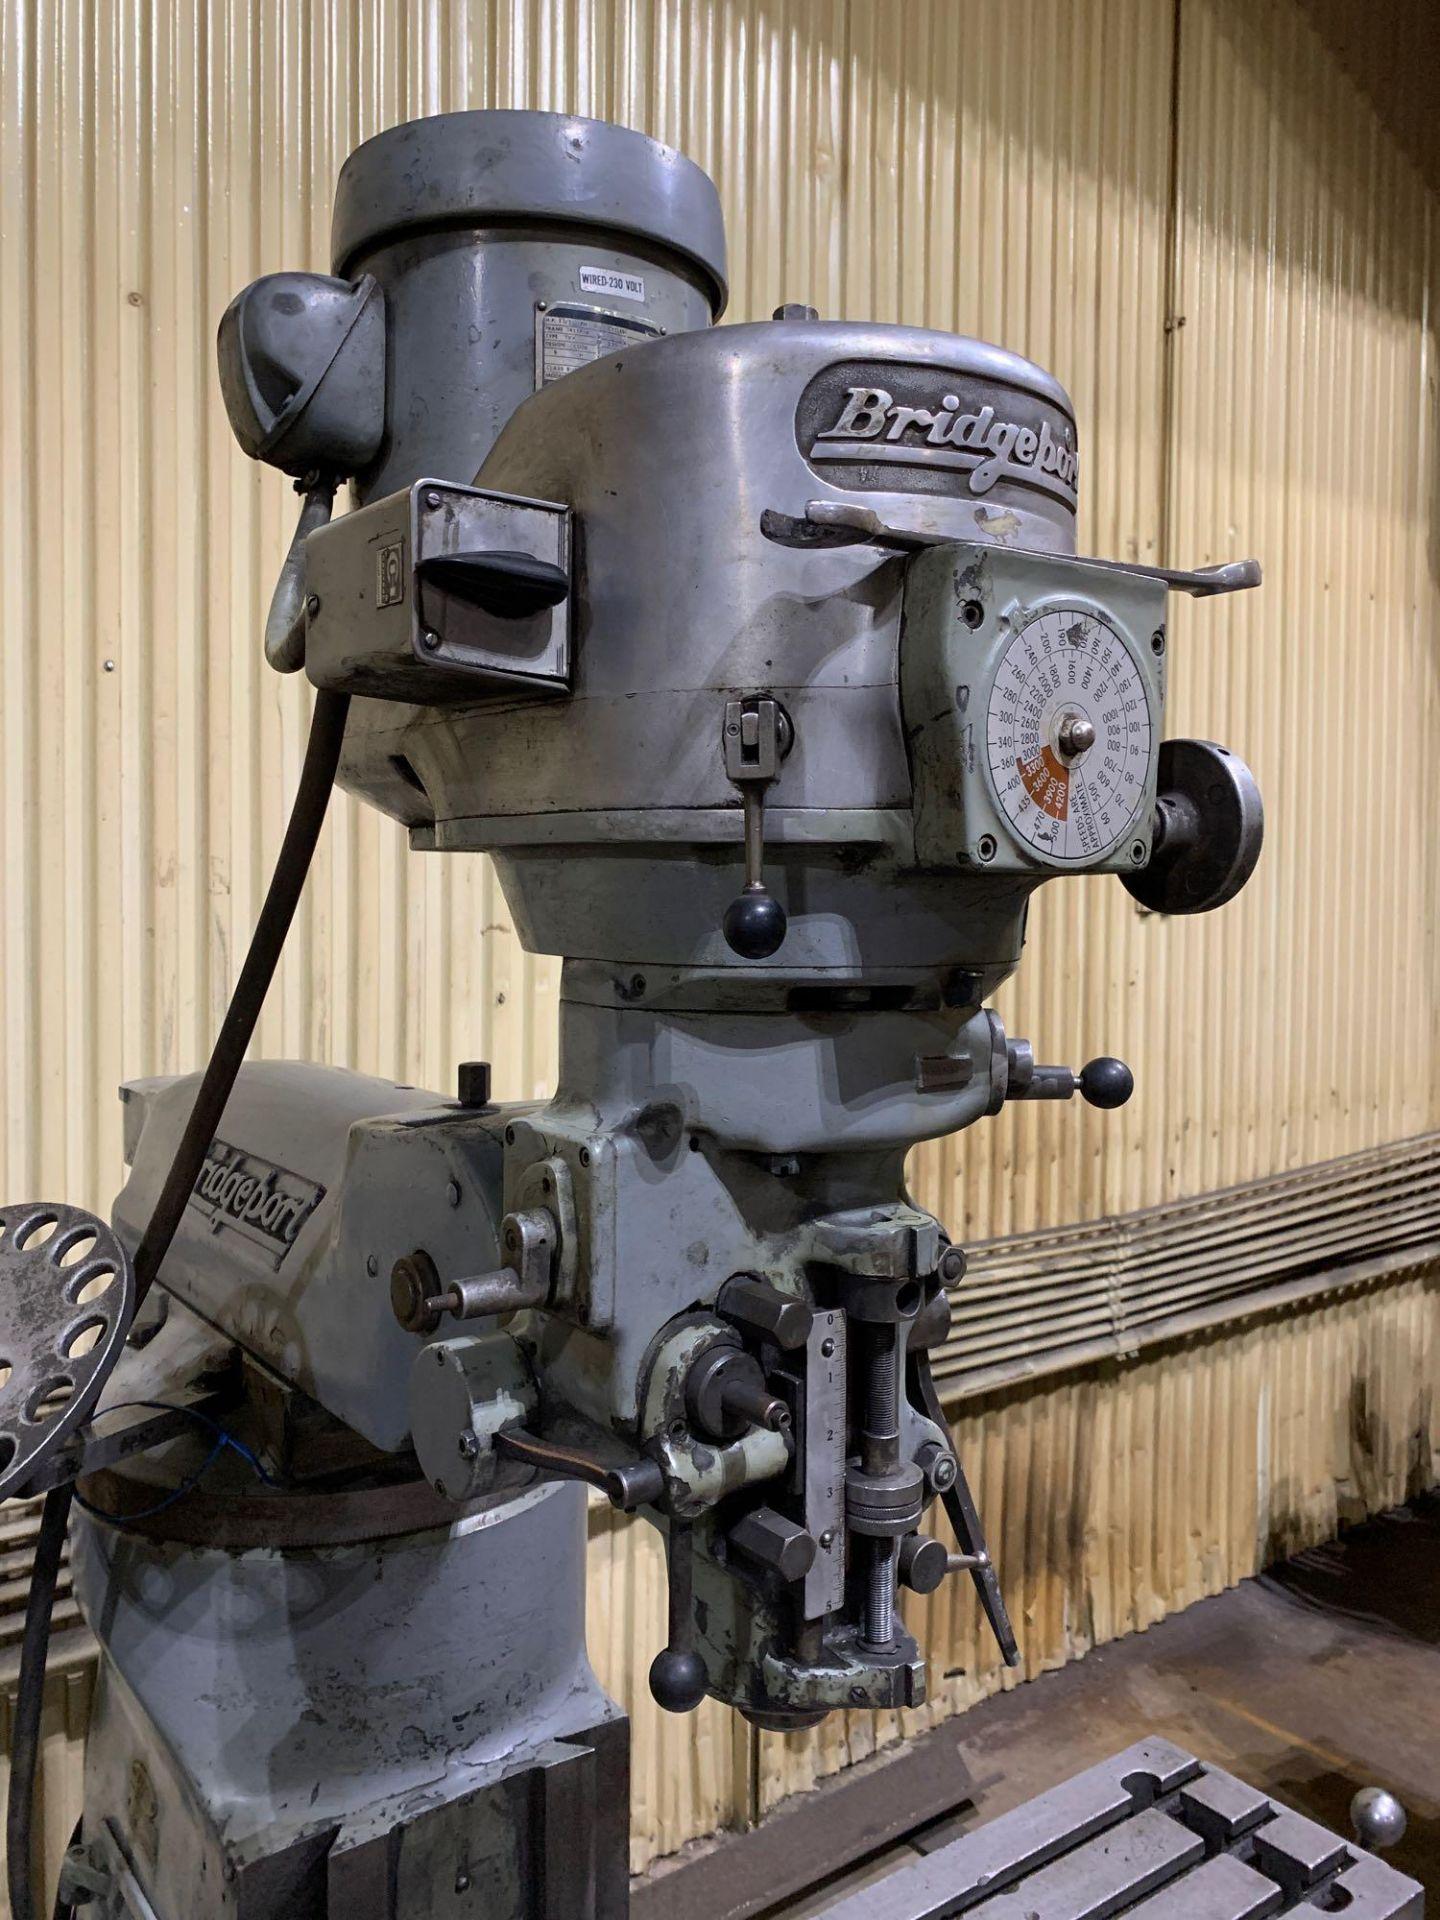 "Bridgeport 2J Vertical Milling Machine Variable Speed Head S/N 132833 CAPACITIES Table size: 9"" X 42 - Image 4 of 12"